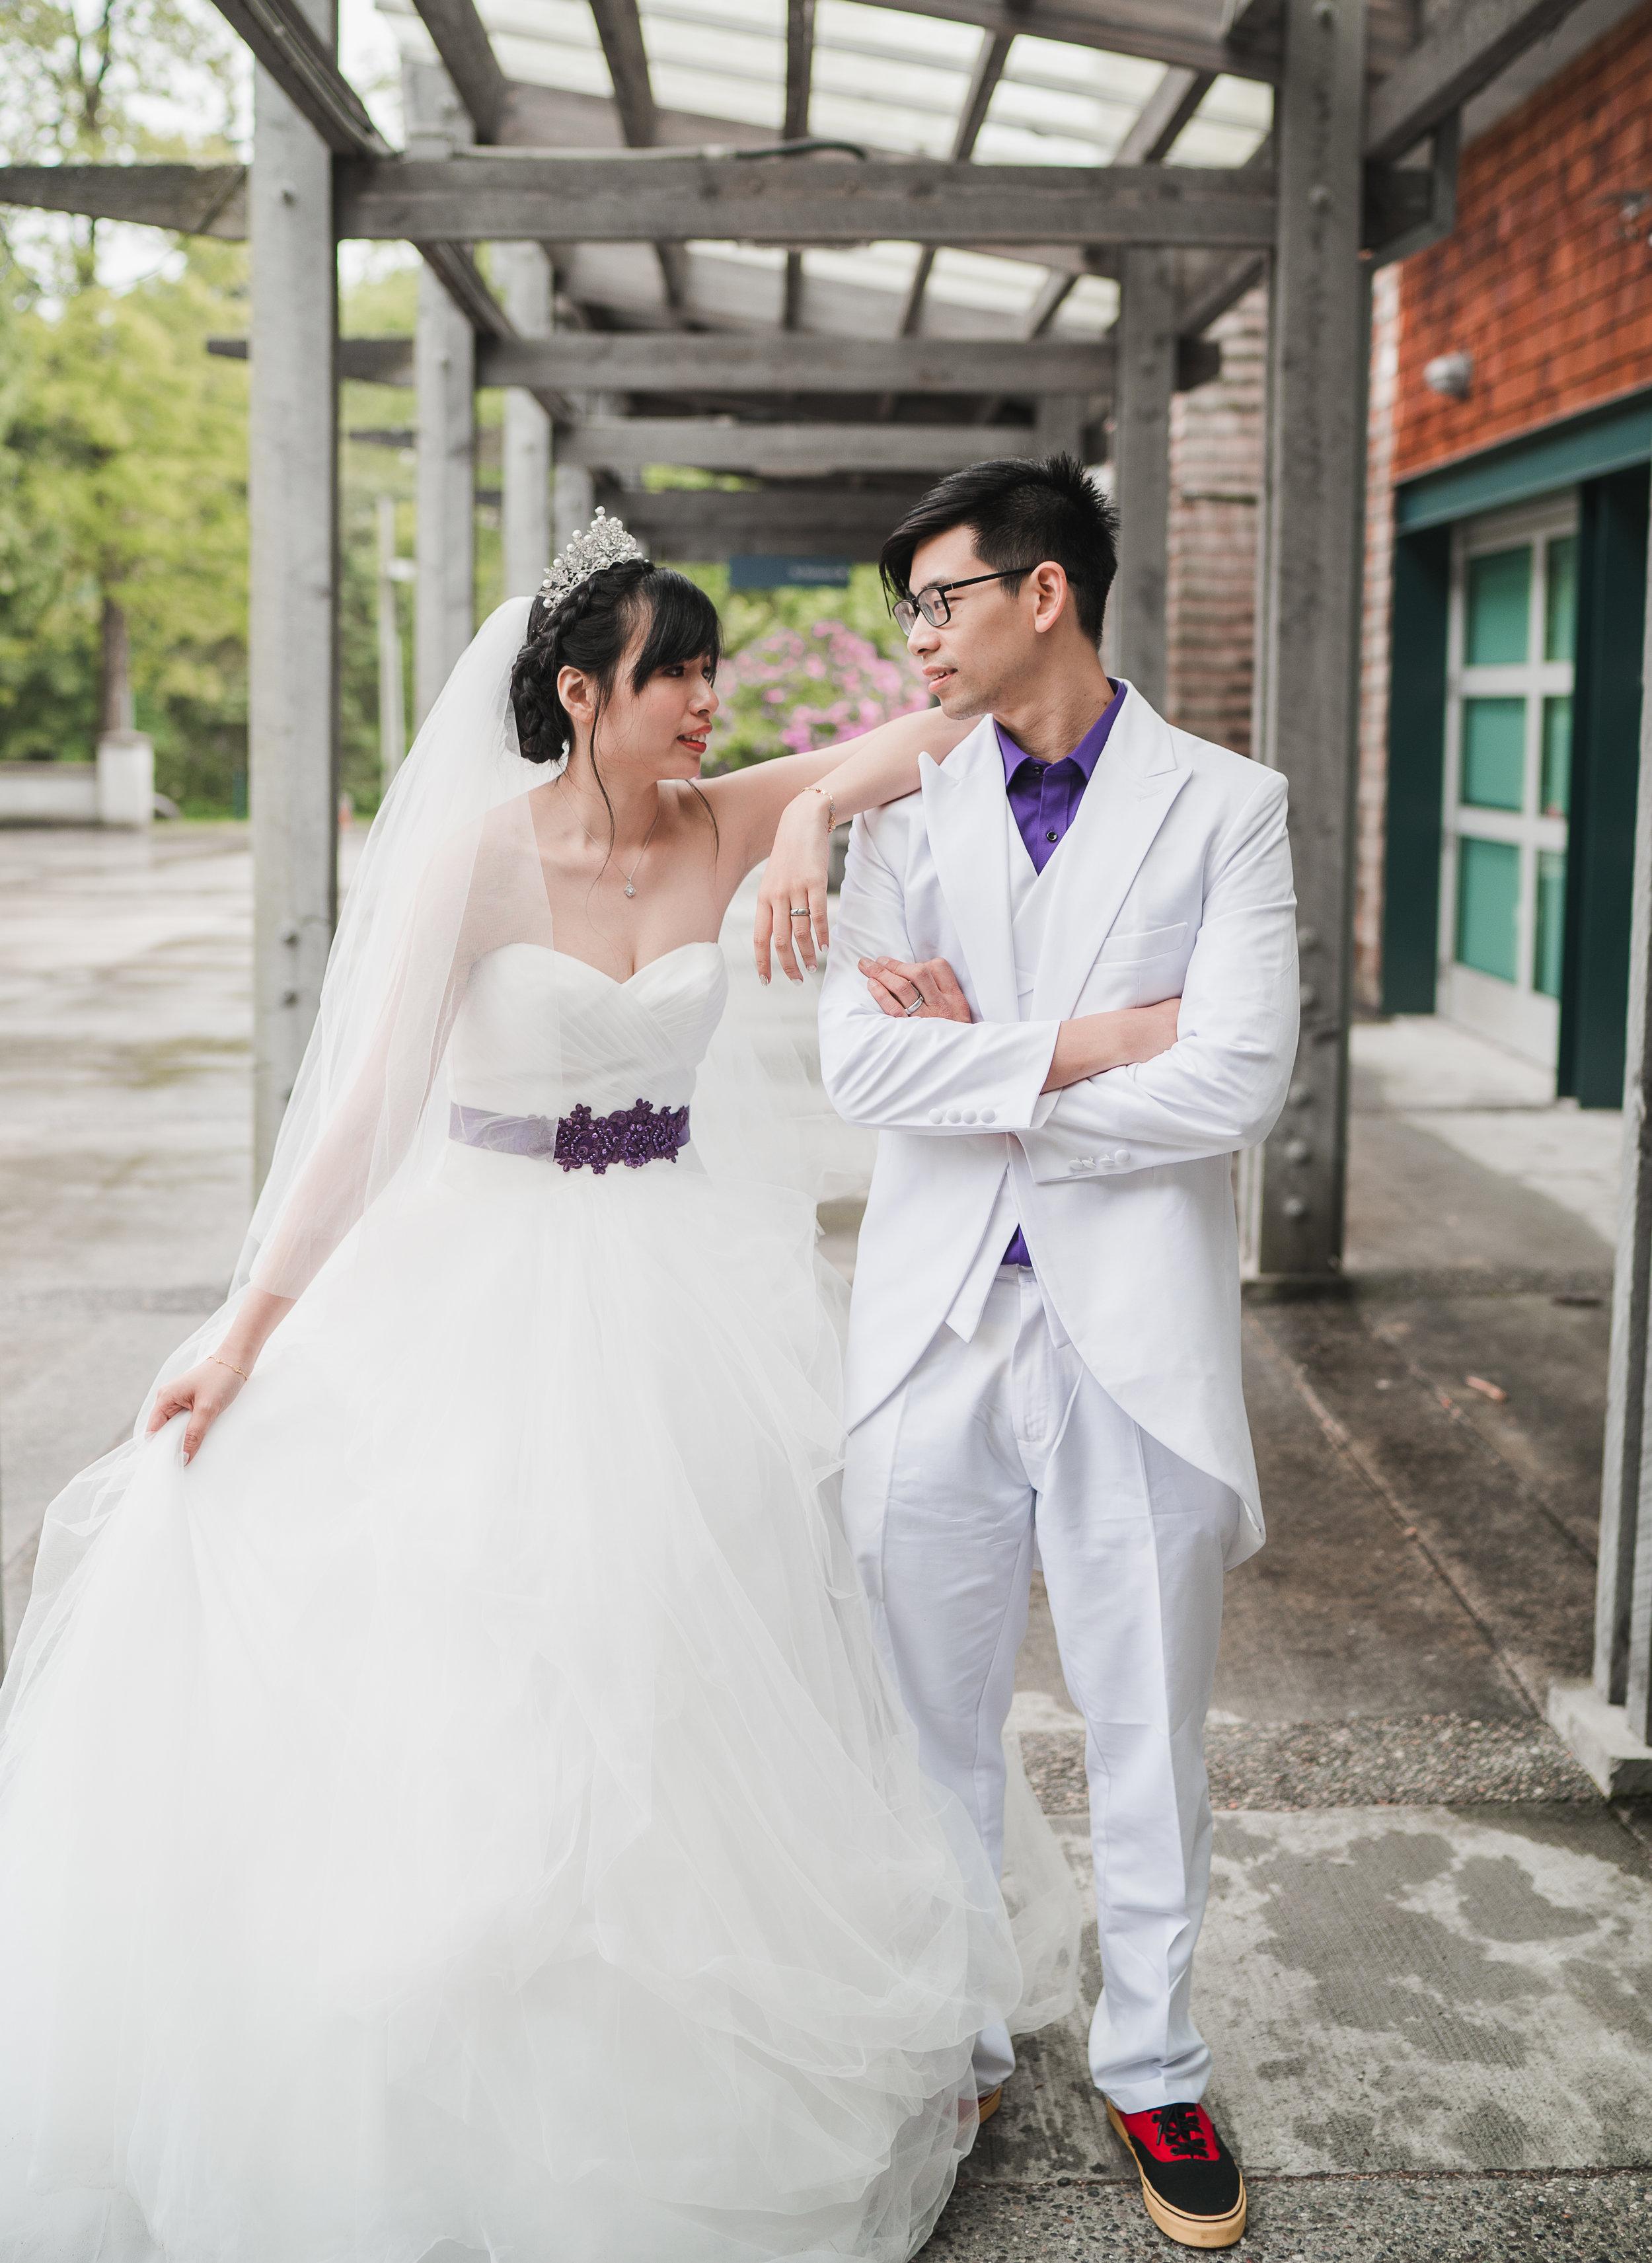 20190520 - Pamela & Matthew Wedding- 0719.jpg